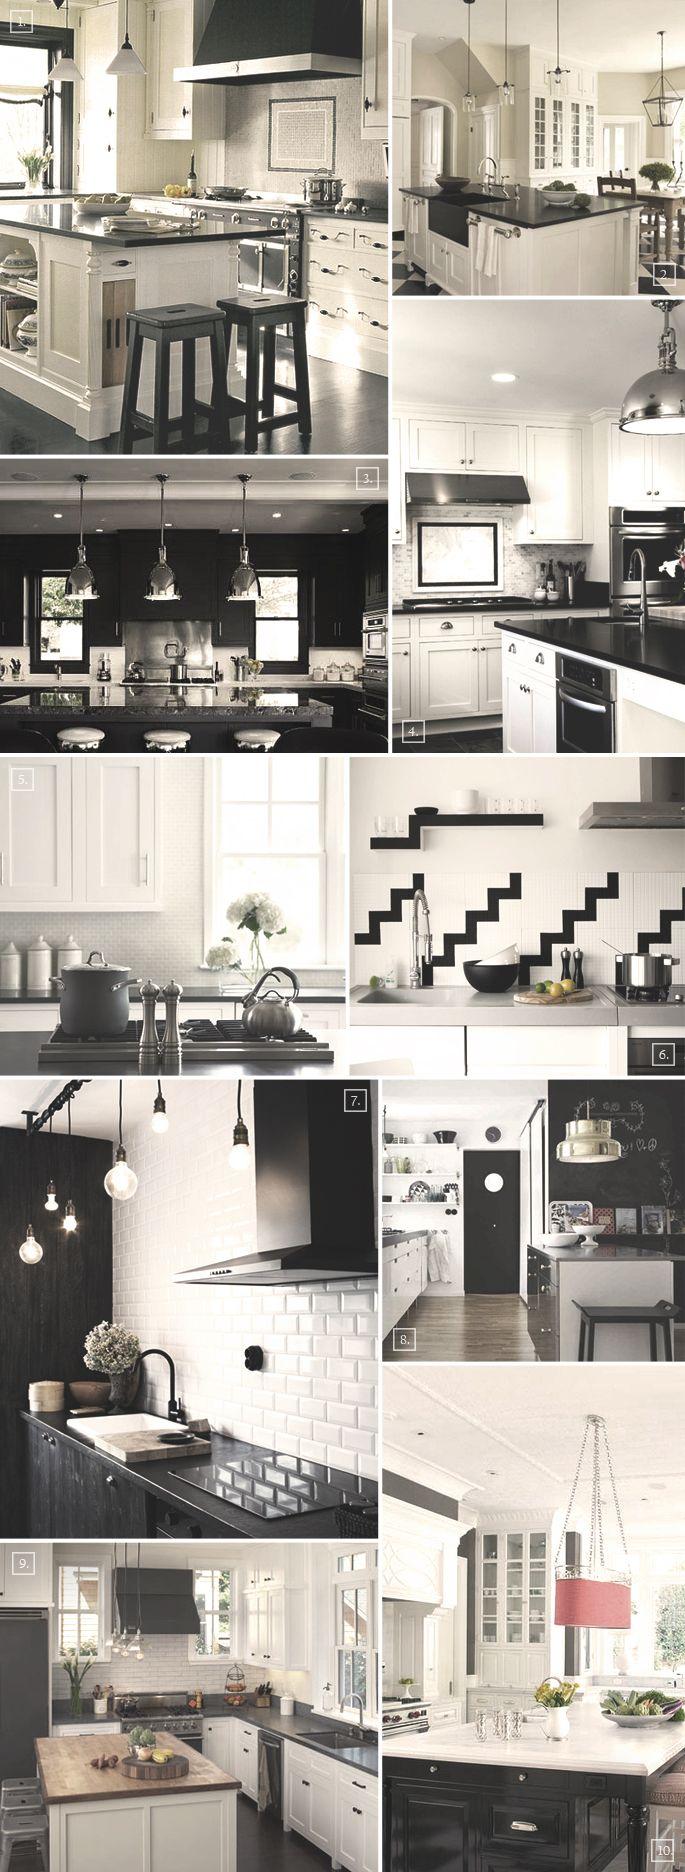 Black and white kitchen styles